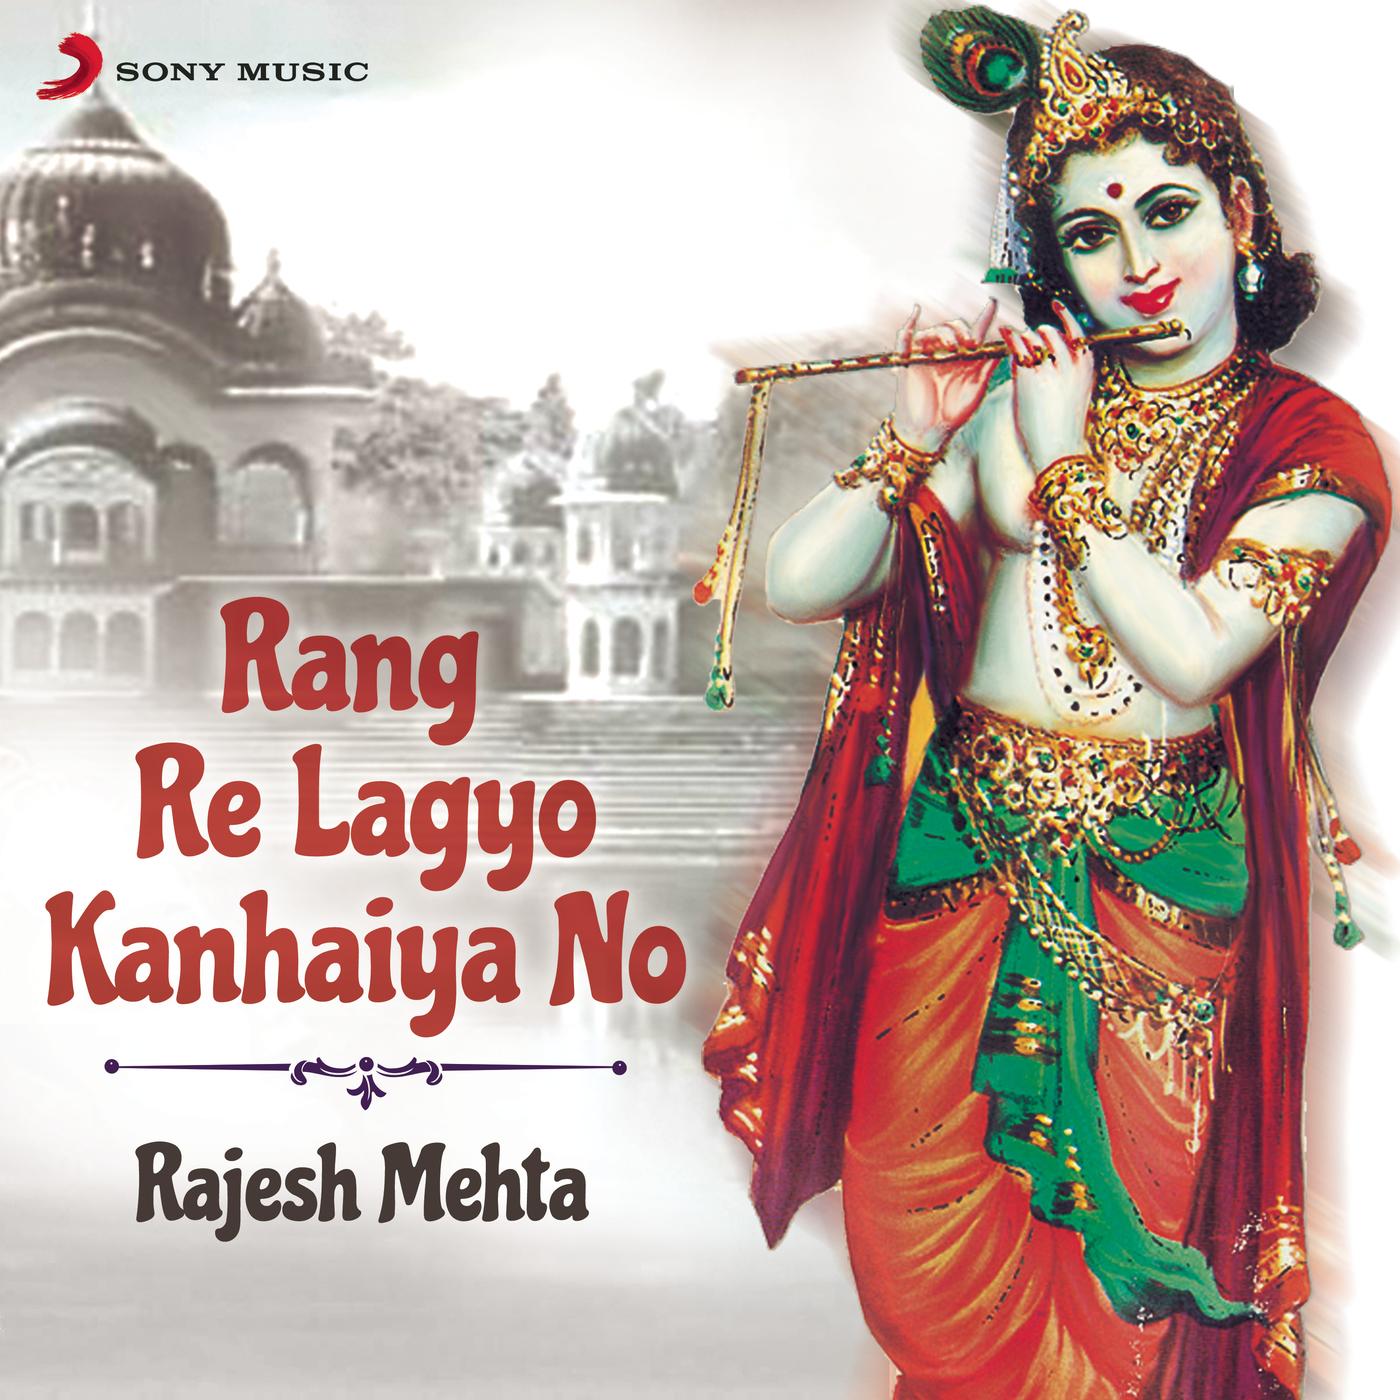 Rang Re Lagyo Kanhaiya No - Rajesh Mehta